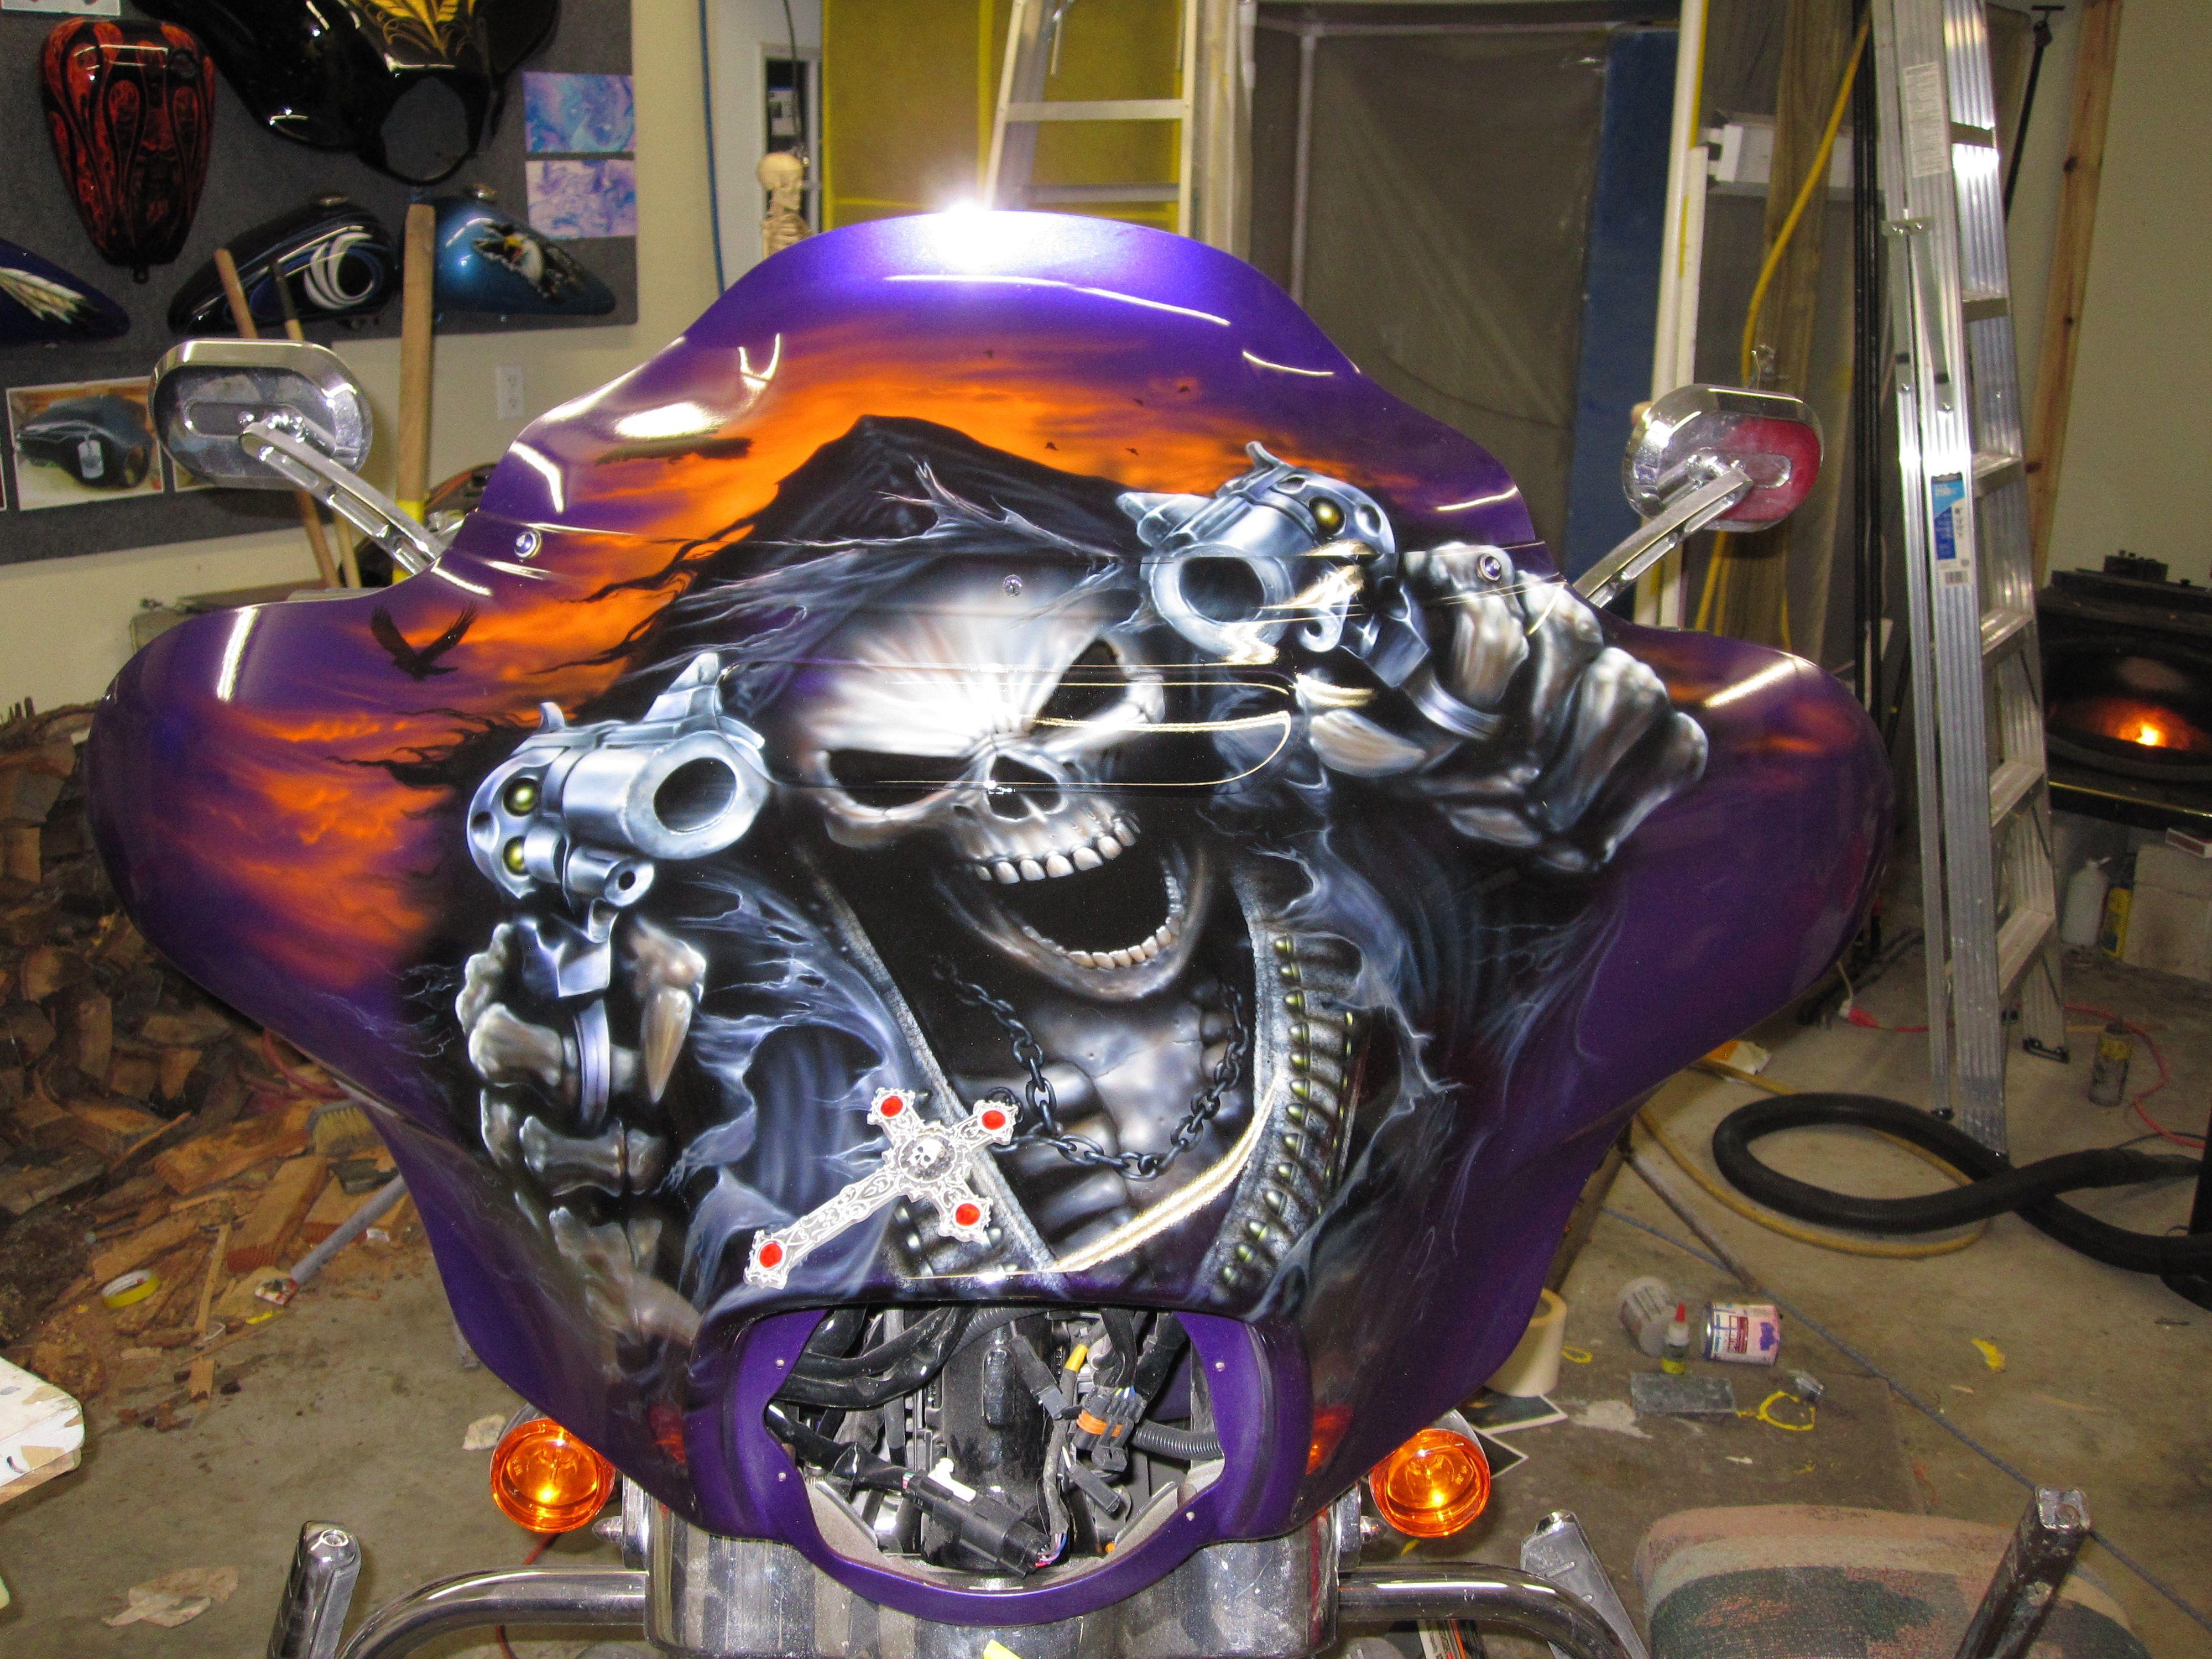 Outlaw reaper on Harley fairing